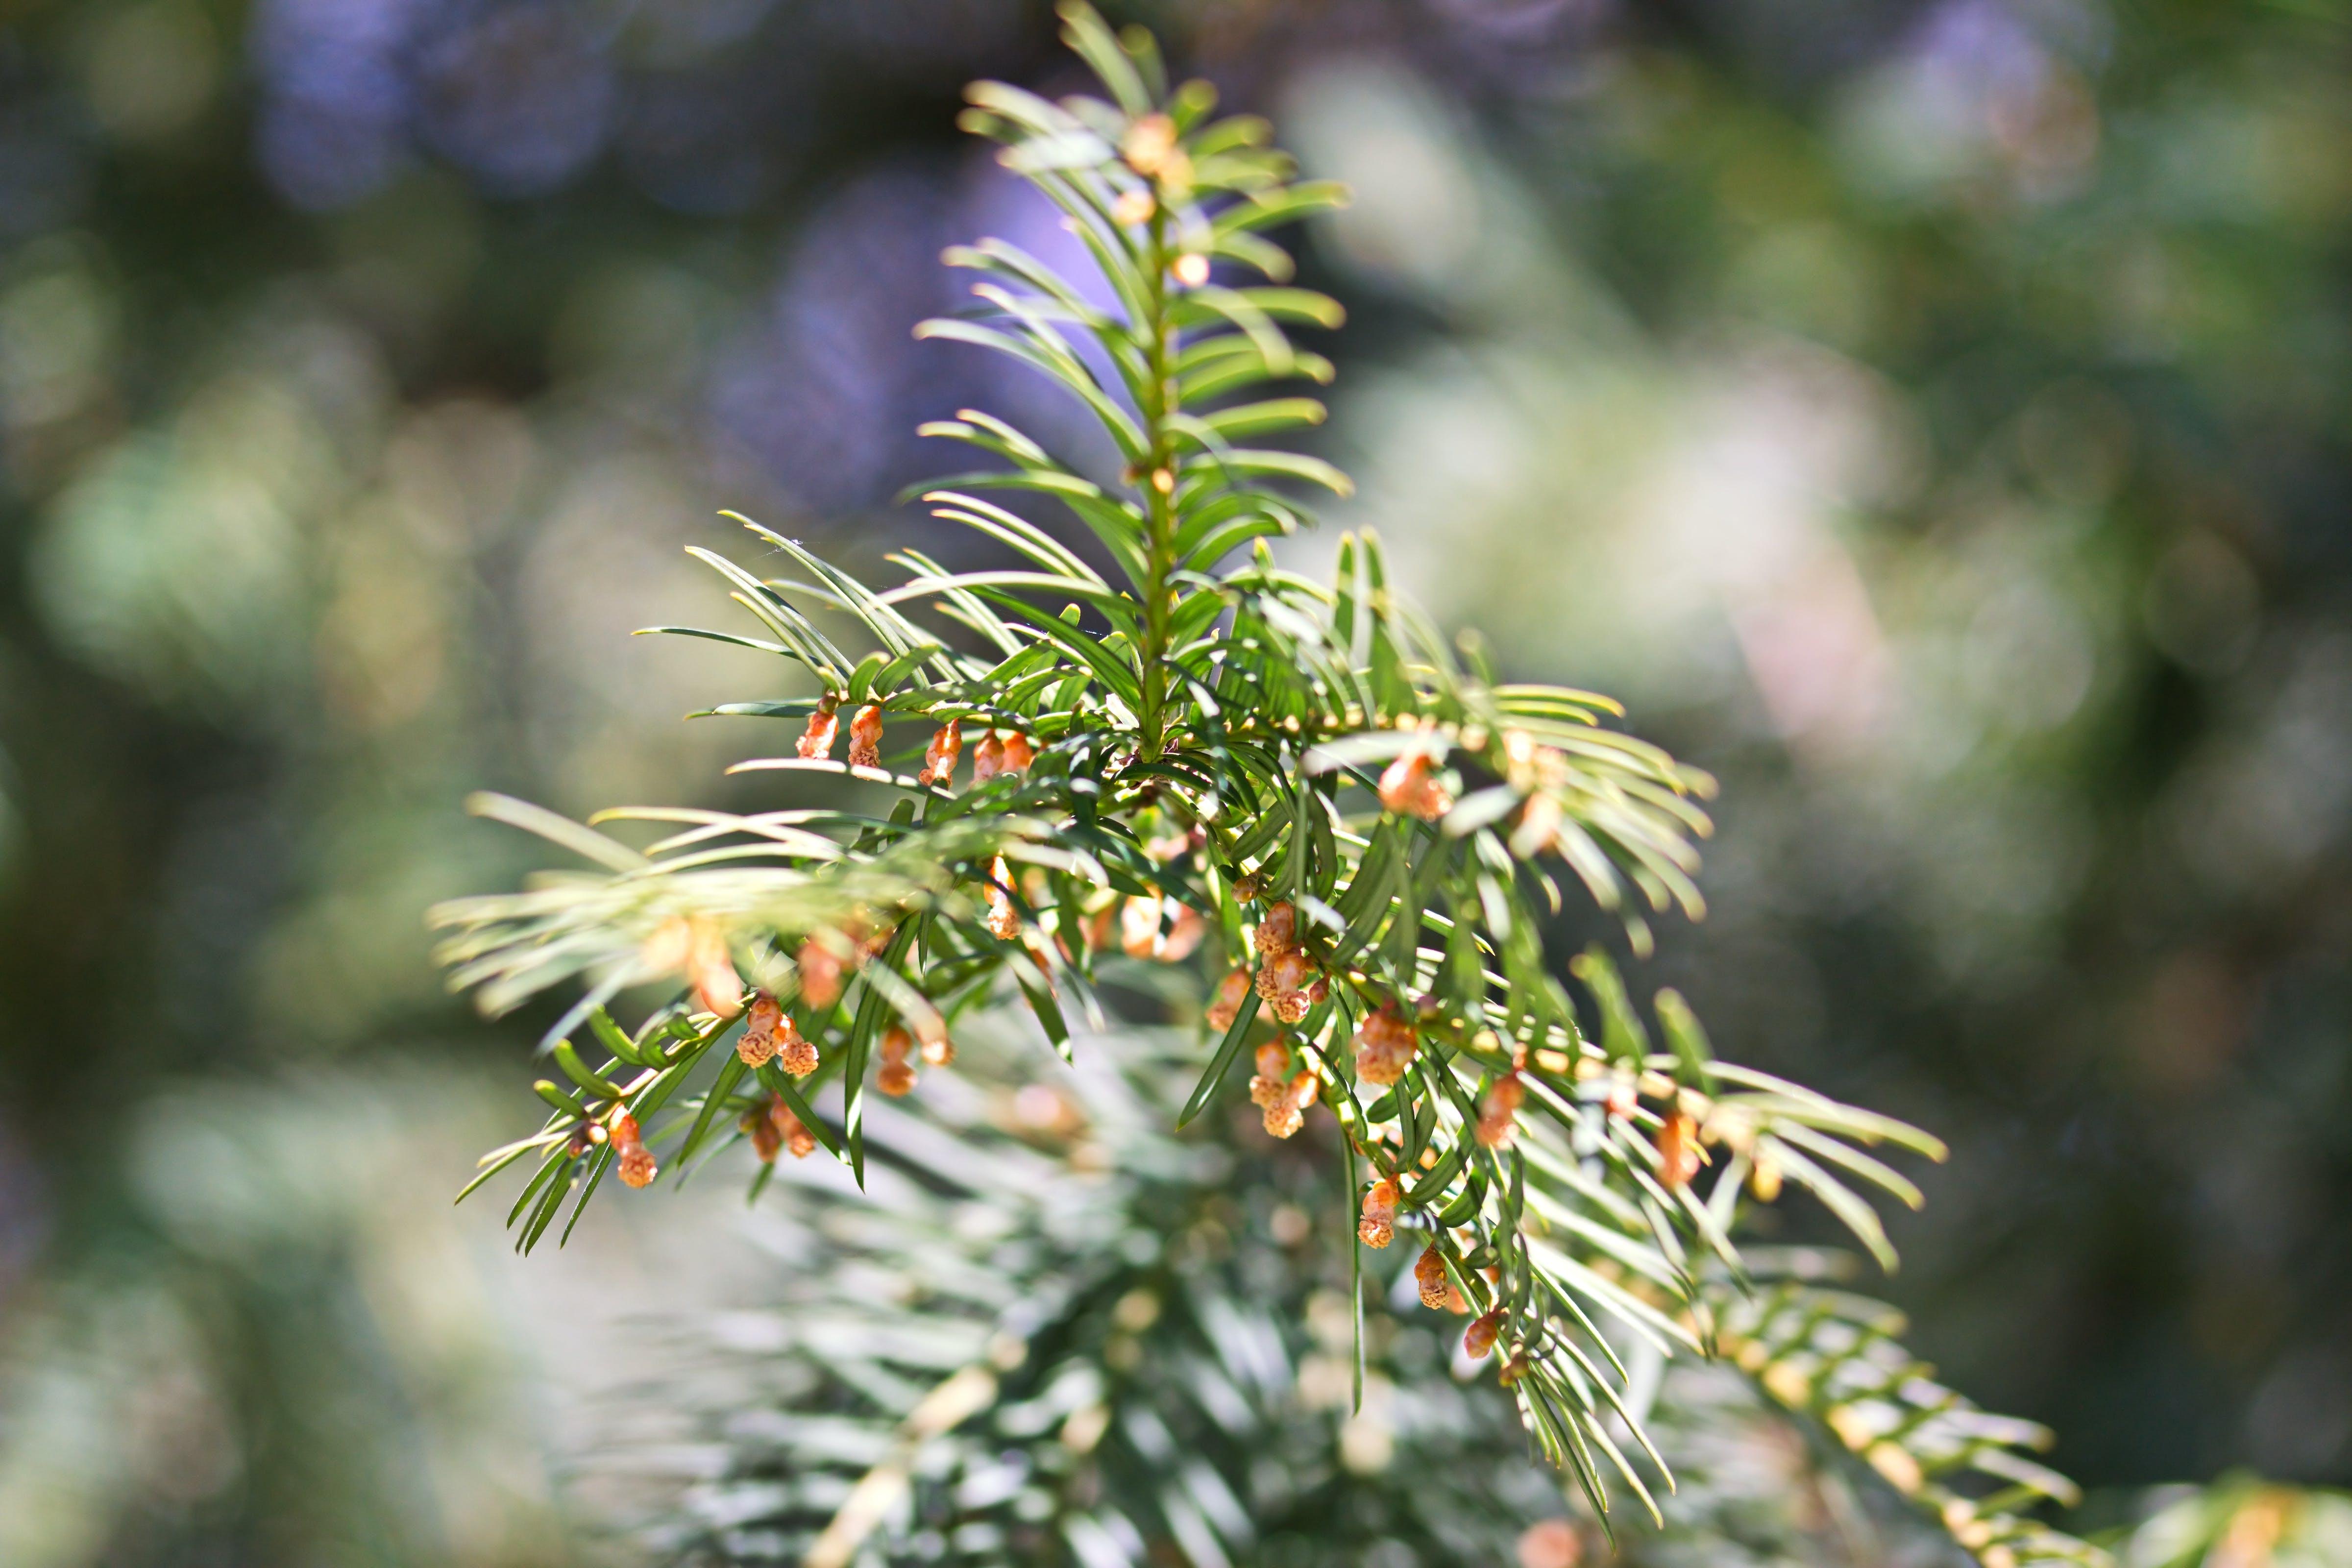 Closeup Photo of Thorn Leaf Plant